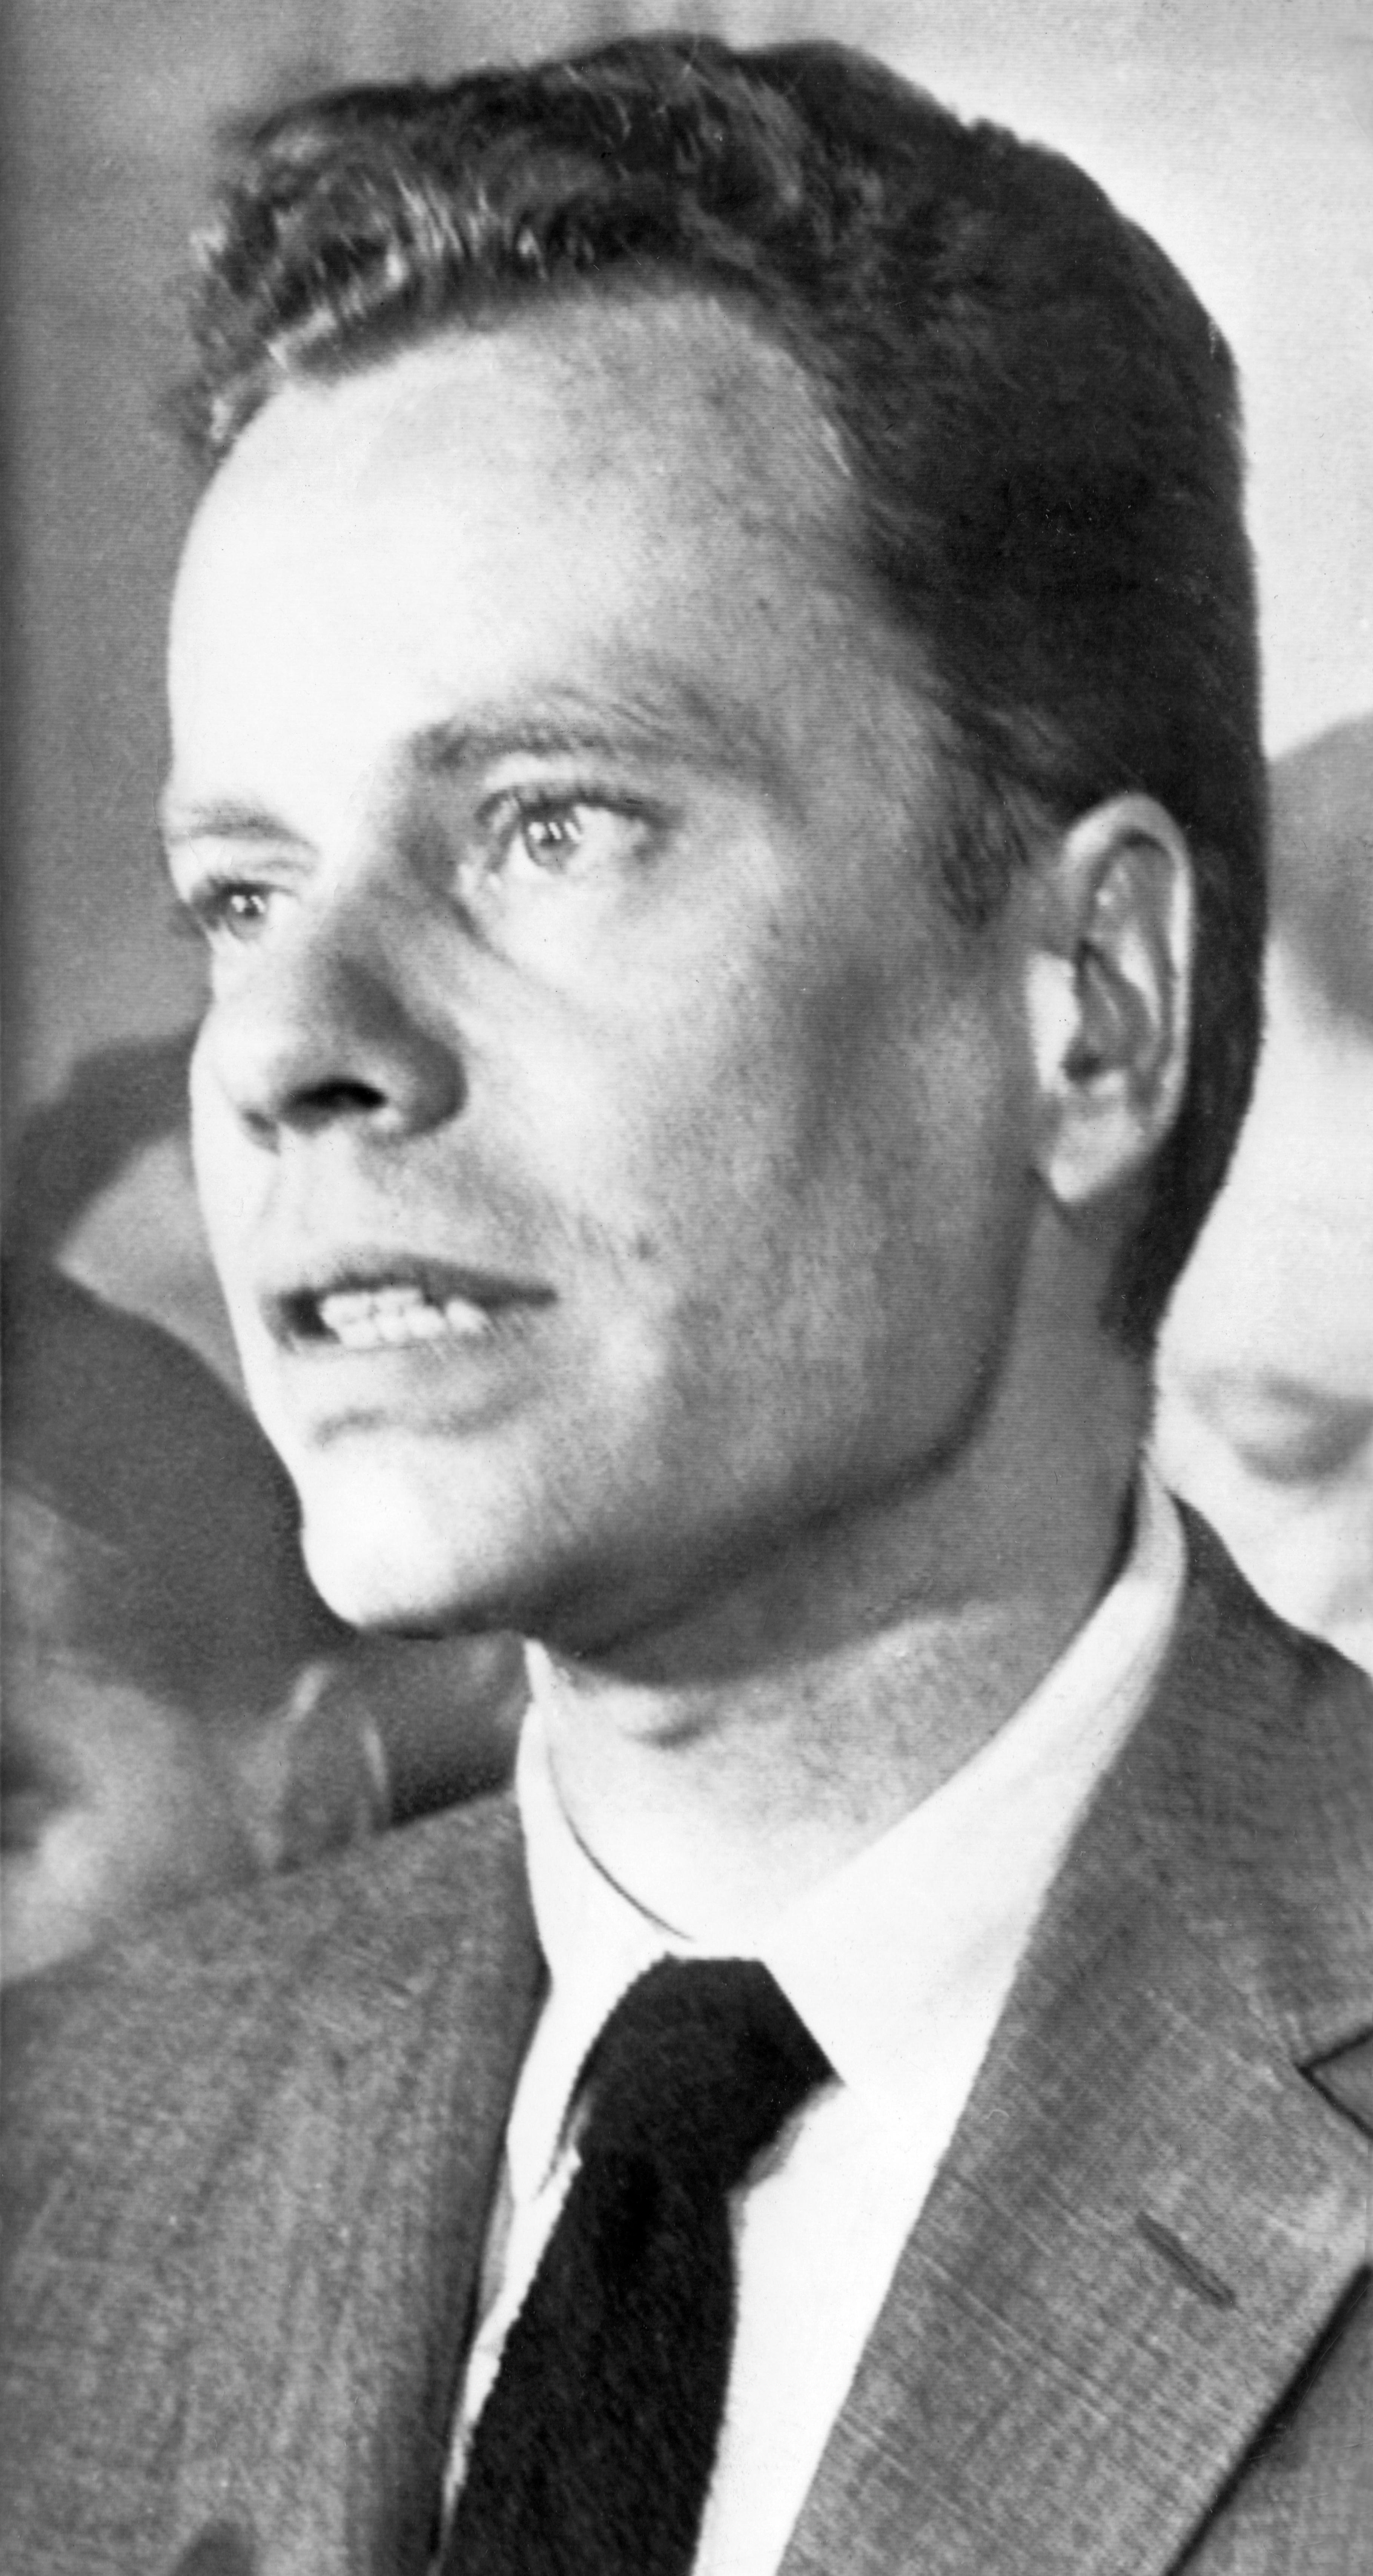 Charles Van Doren - Wikipedia